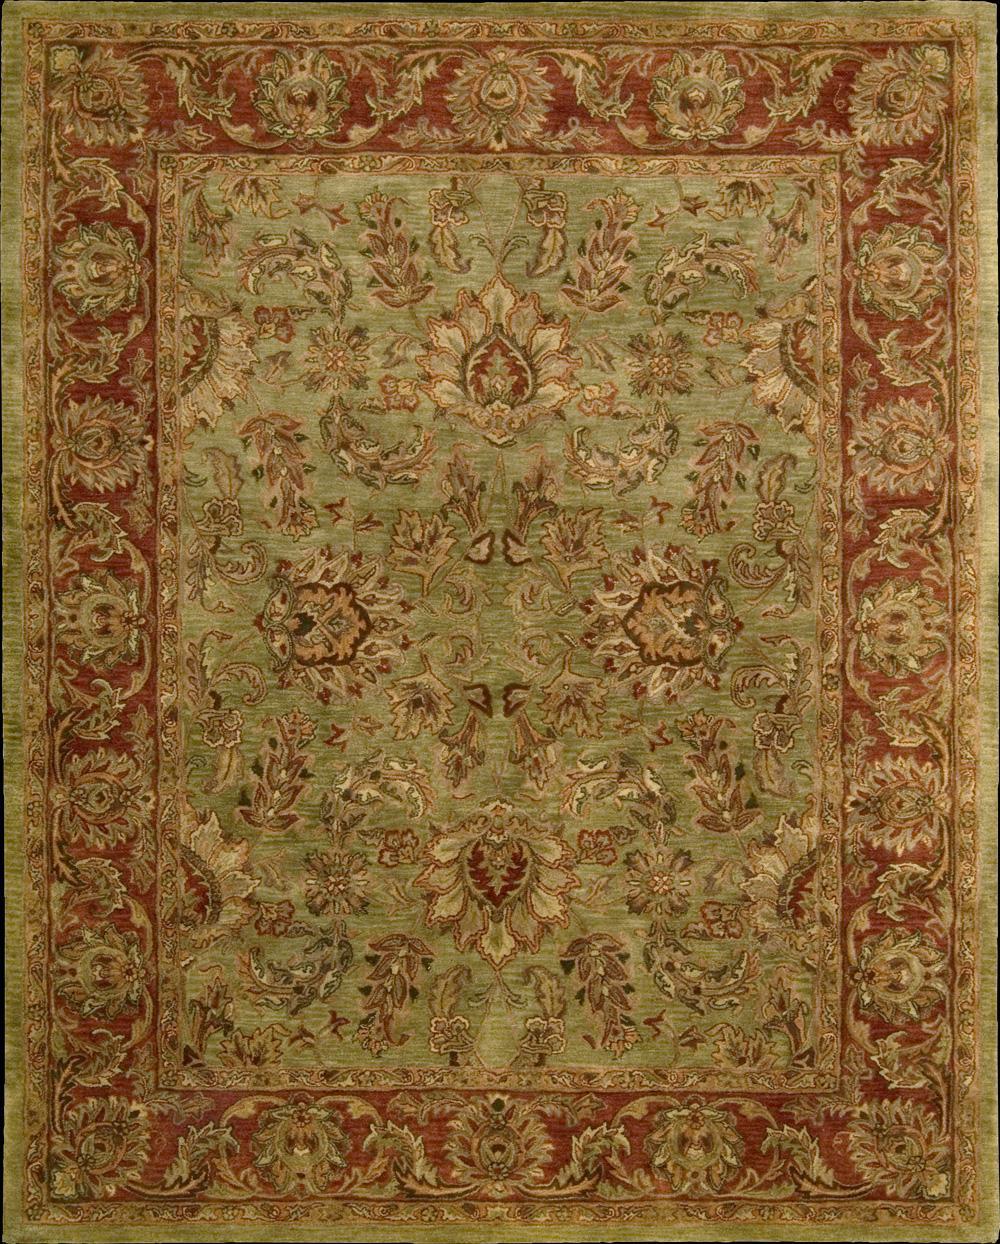 "Nourison Jaipur Area Rug 9'6"" x 13'6"" - Item Number: 30095"